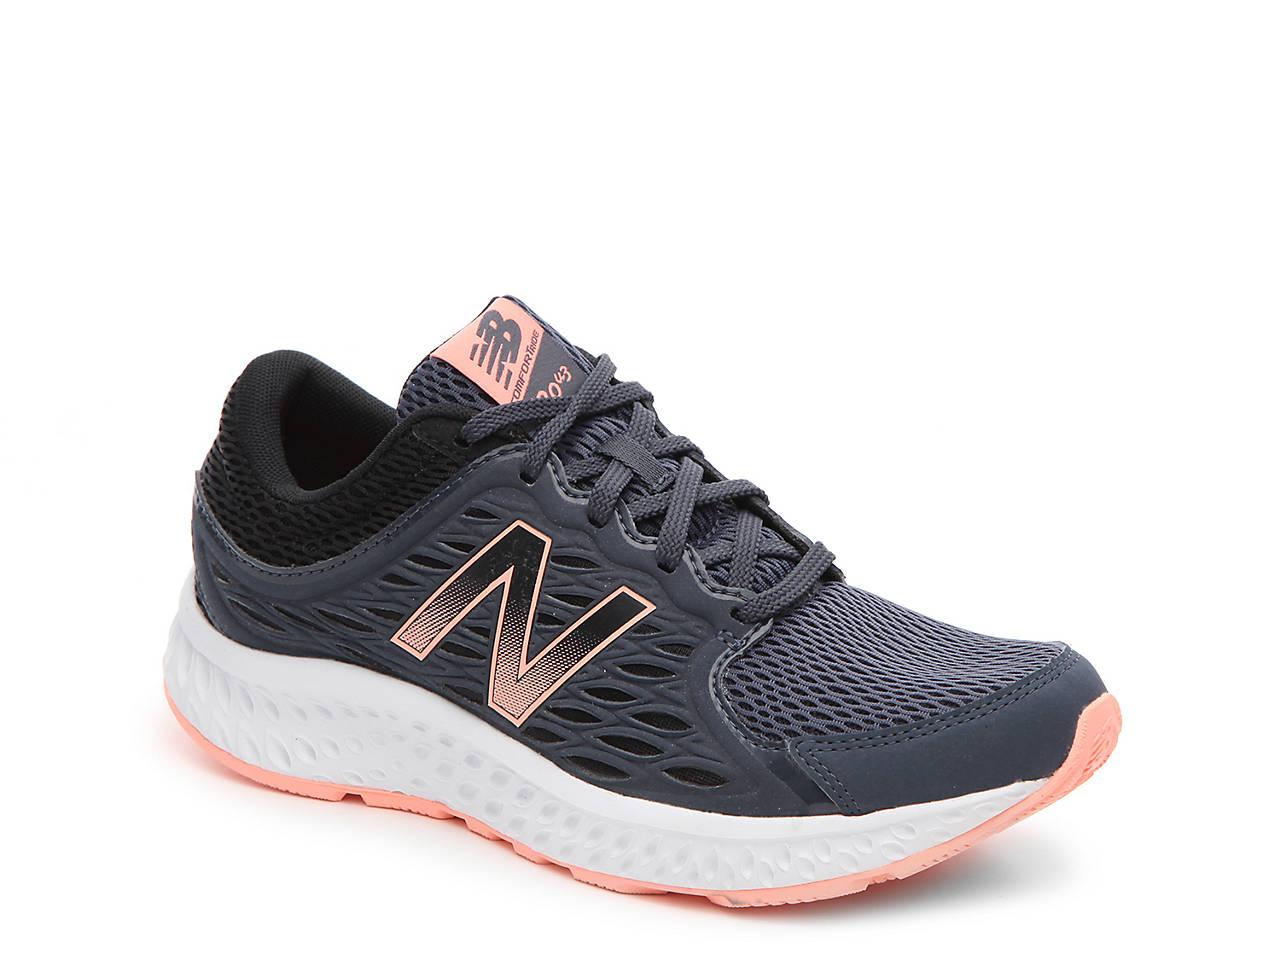 a6499844297cb New Balance 420 v3 Running Shoe - Women's Women's Shoes | DSW